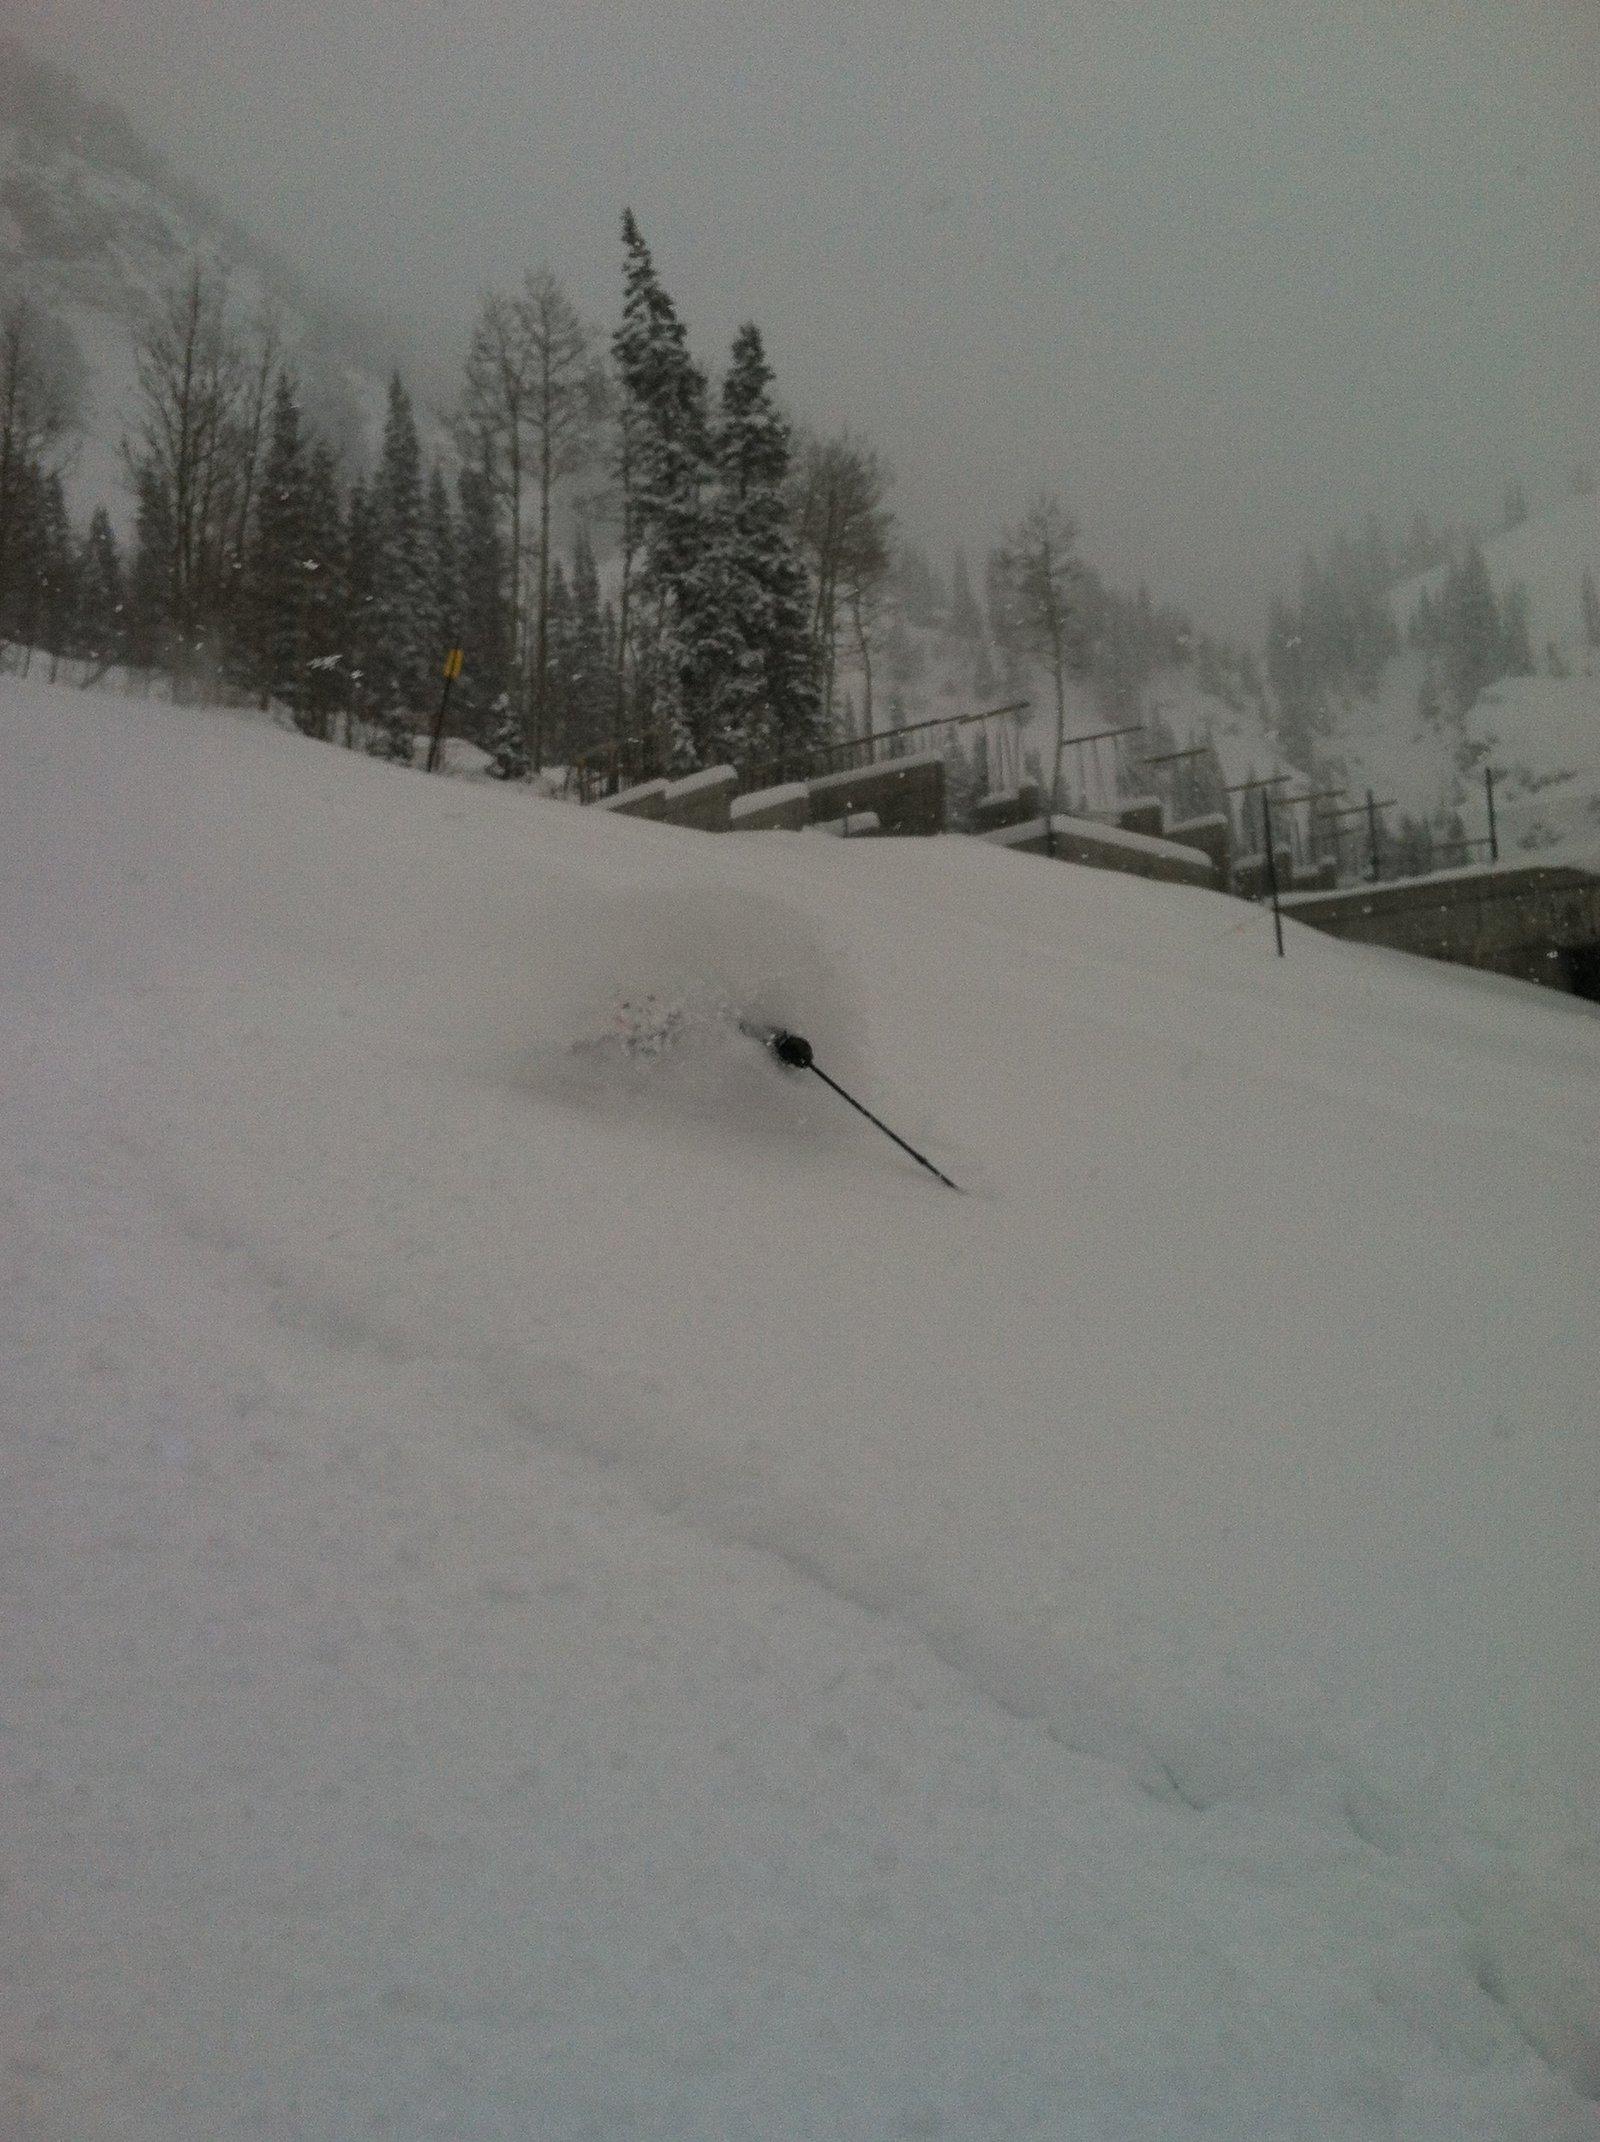 Yesterday @ Snowbird